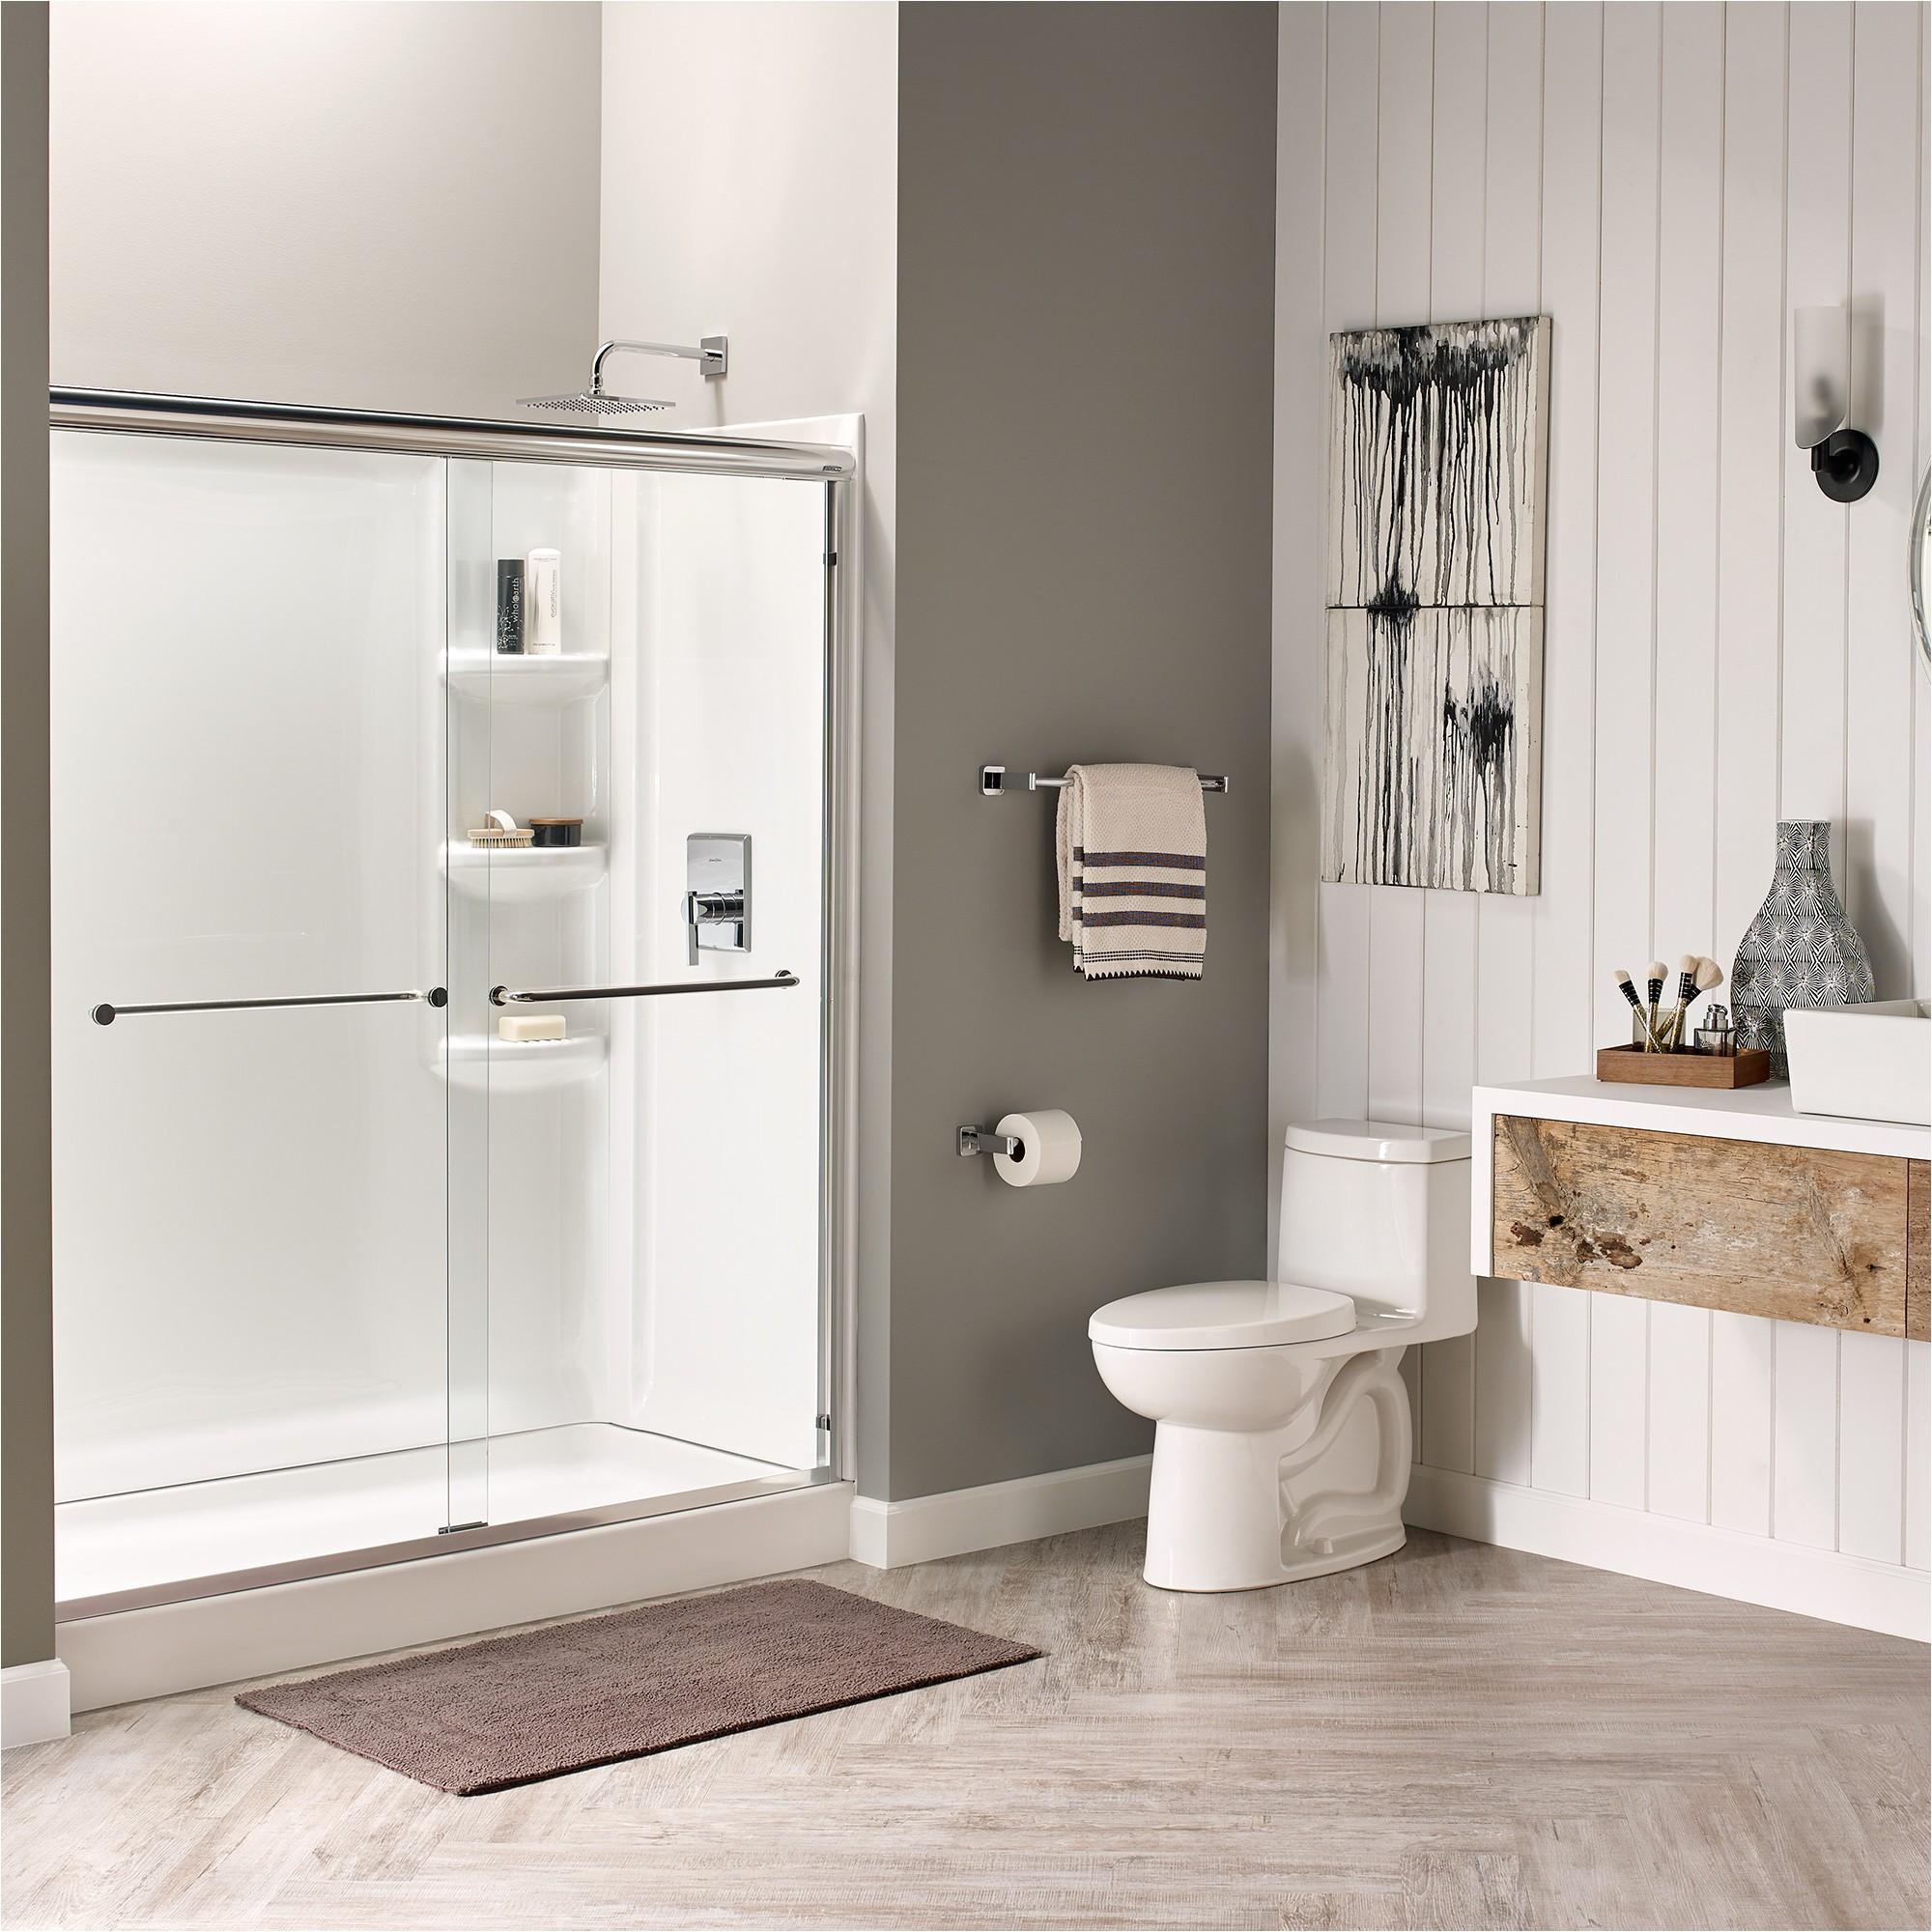 tile redi shower pan luxury shower bases american standard of tile redi shower pan png